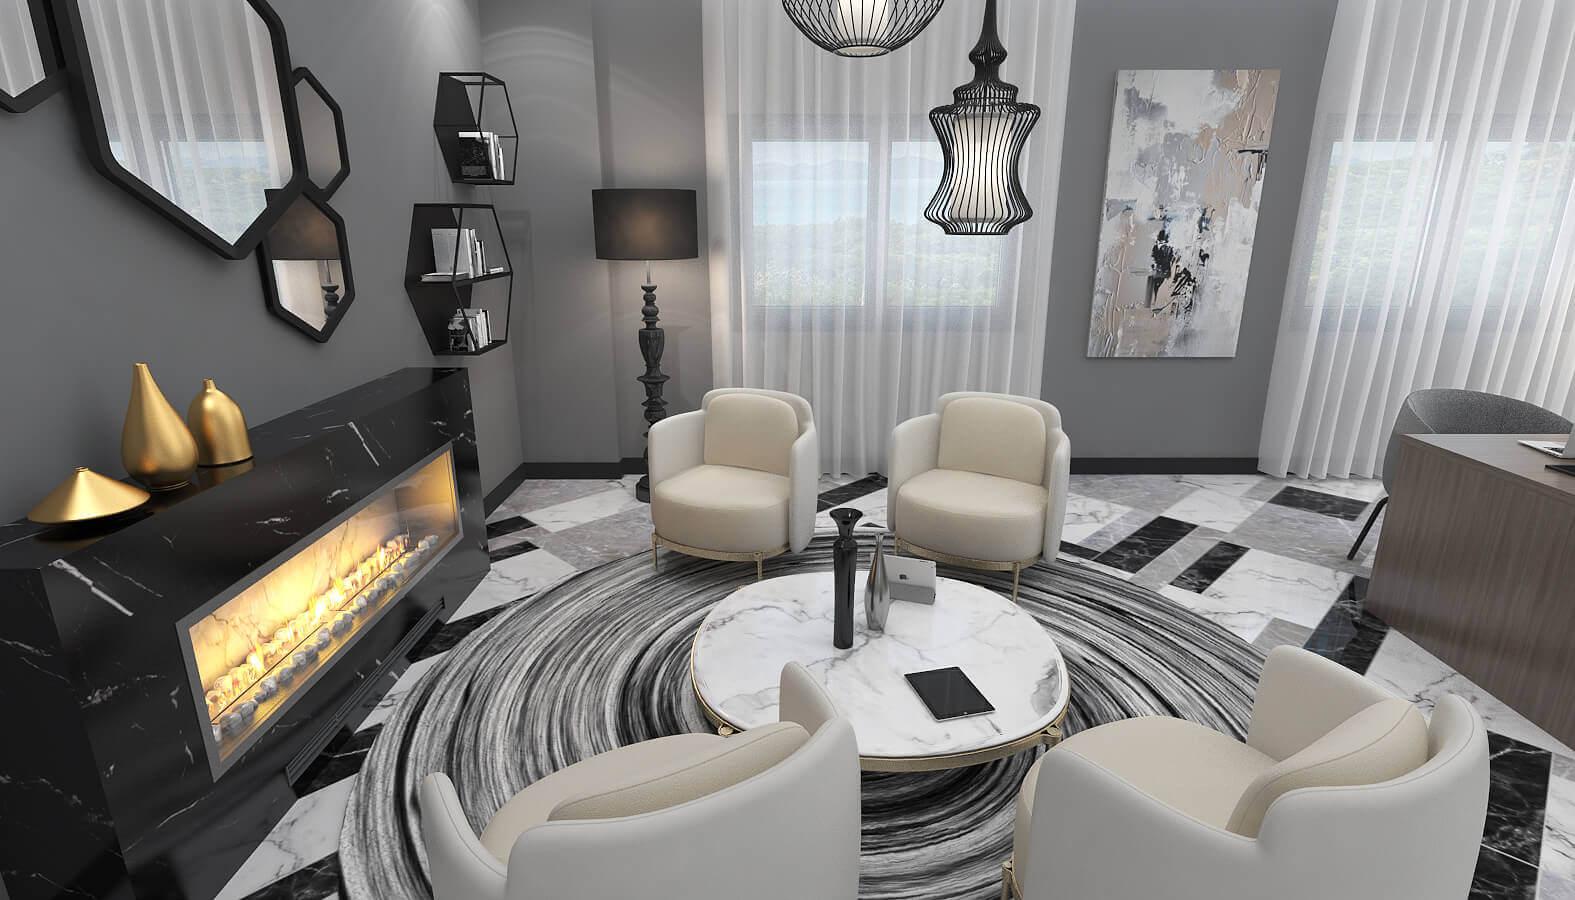 Lobby design 3594 Dogruer hotel Hotels